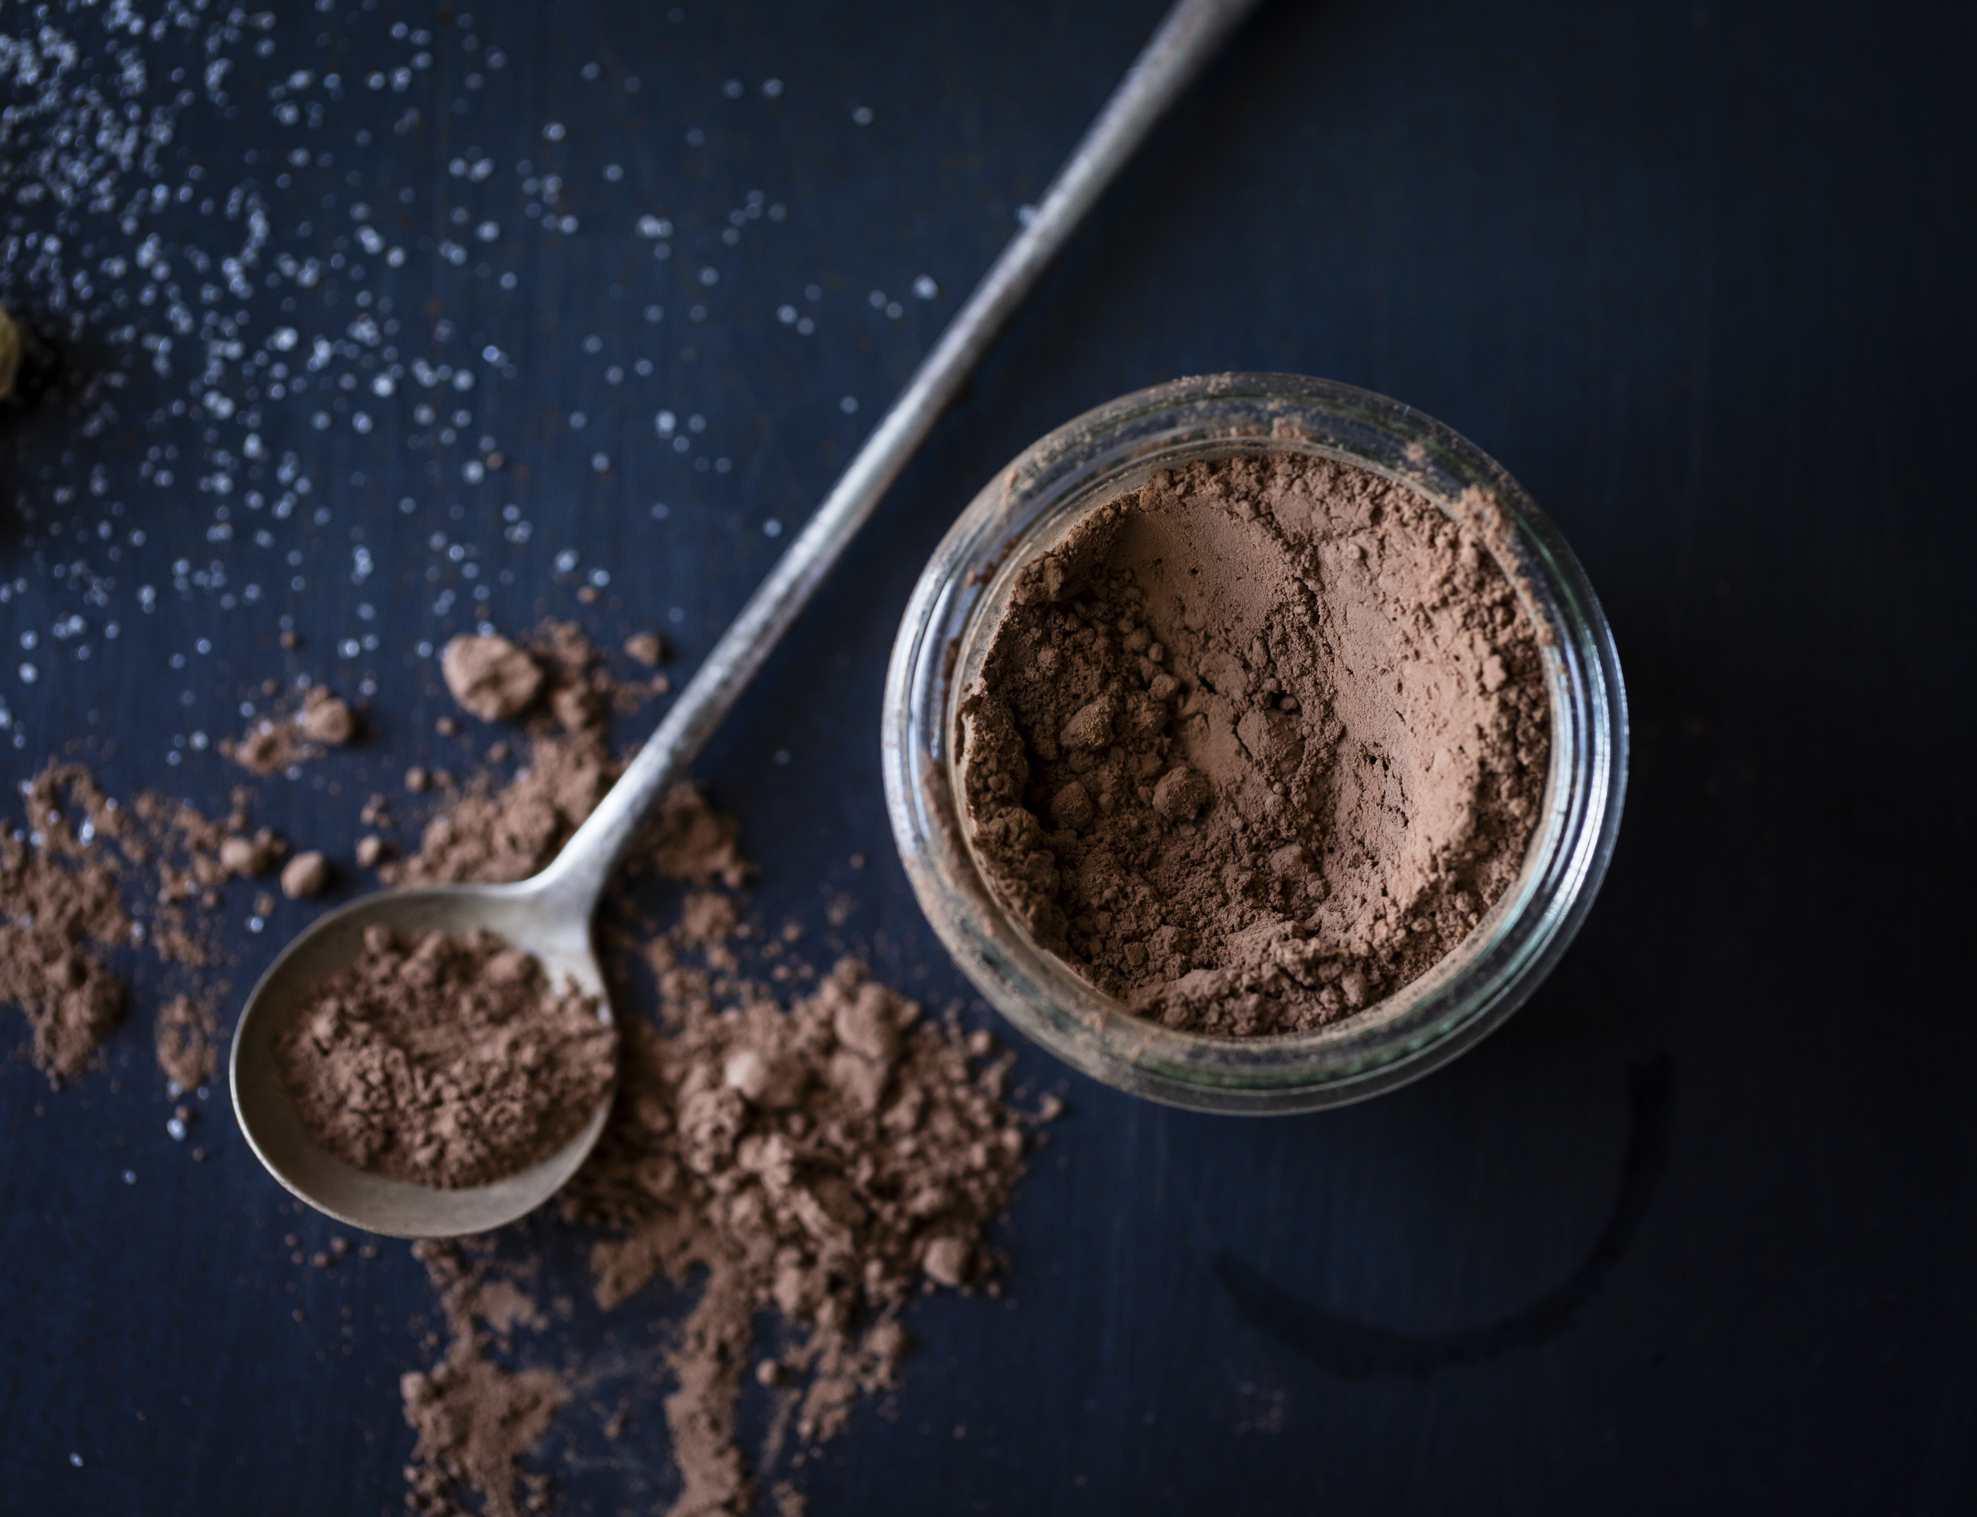 Hot cocoa powder